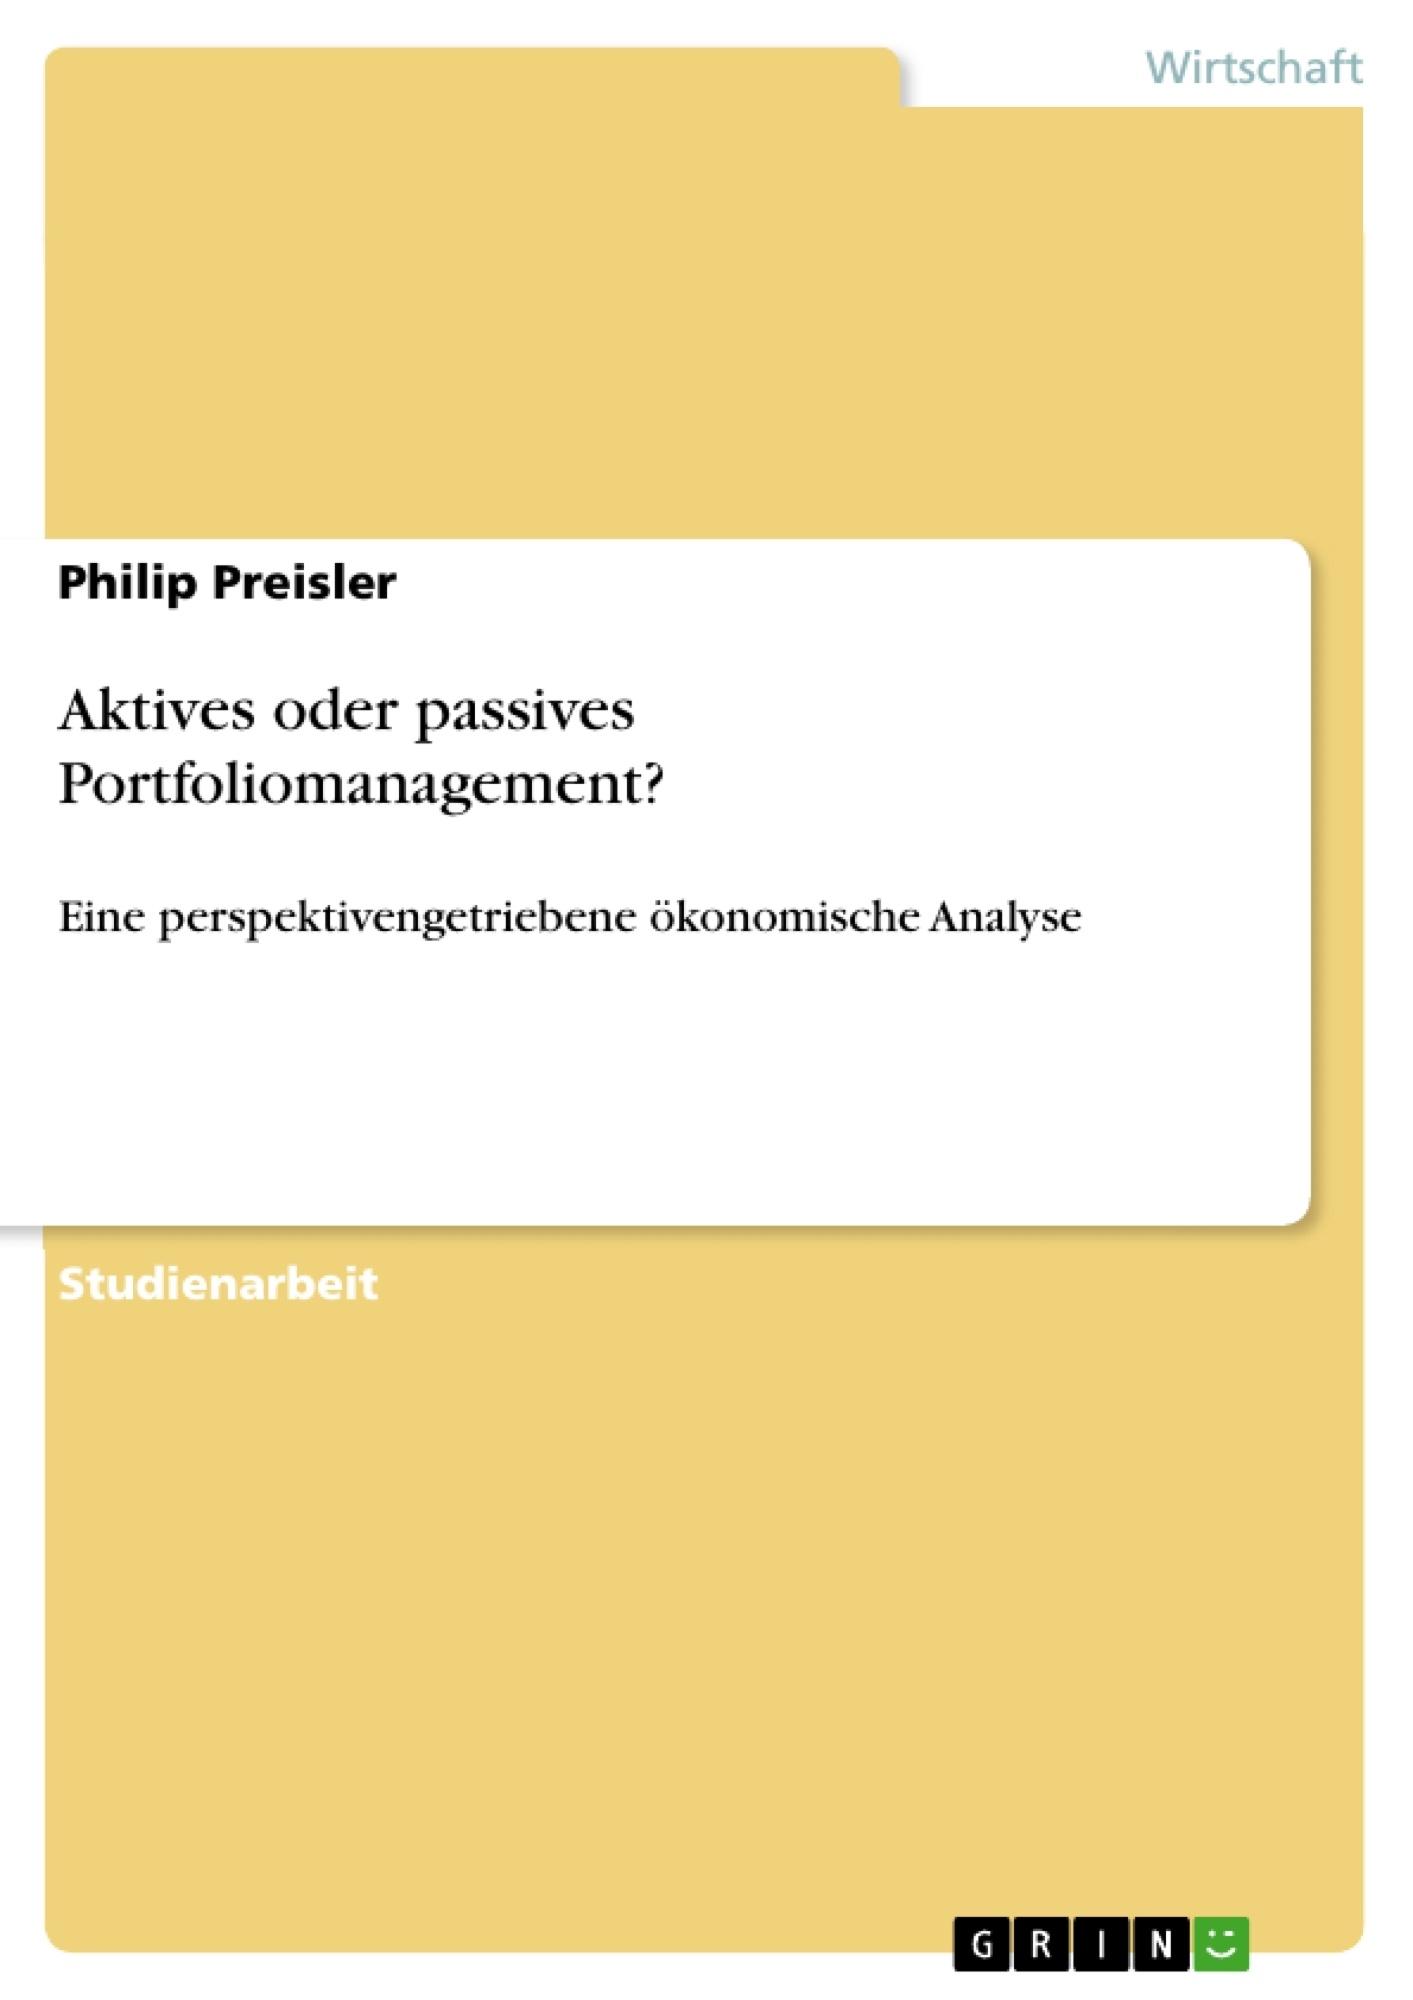 Titel: Aktives oder passives Portfoliomanagement?